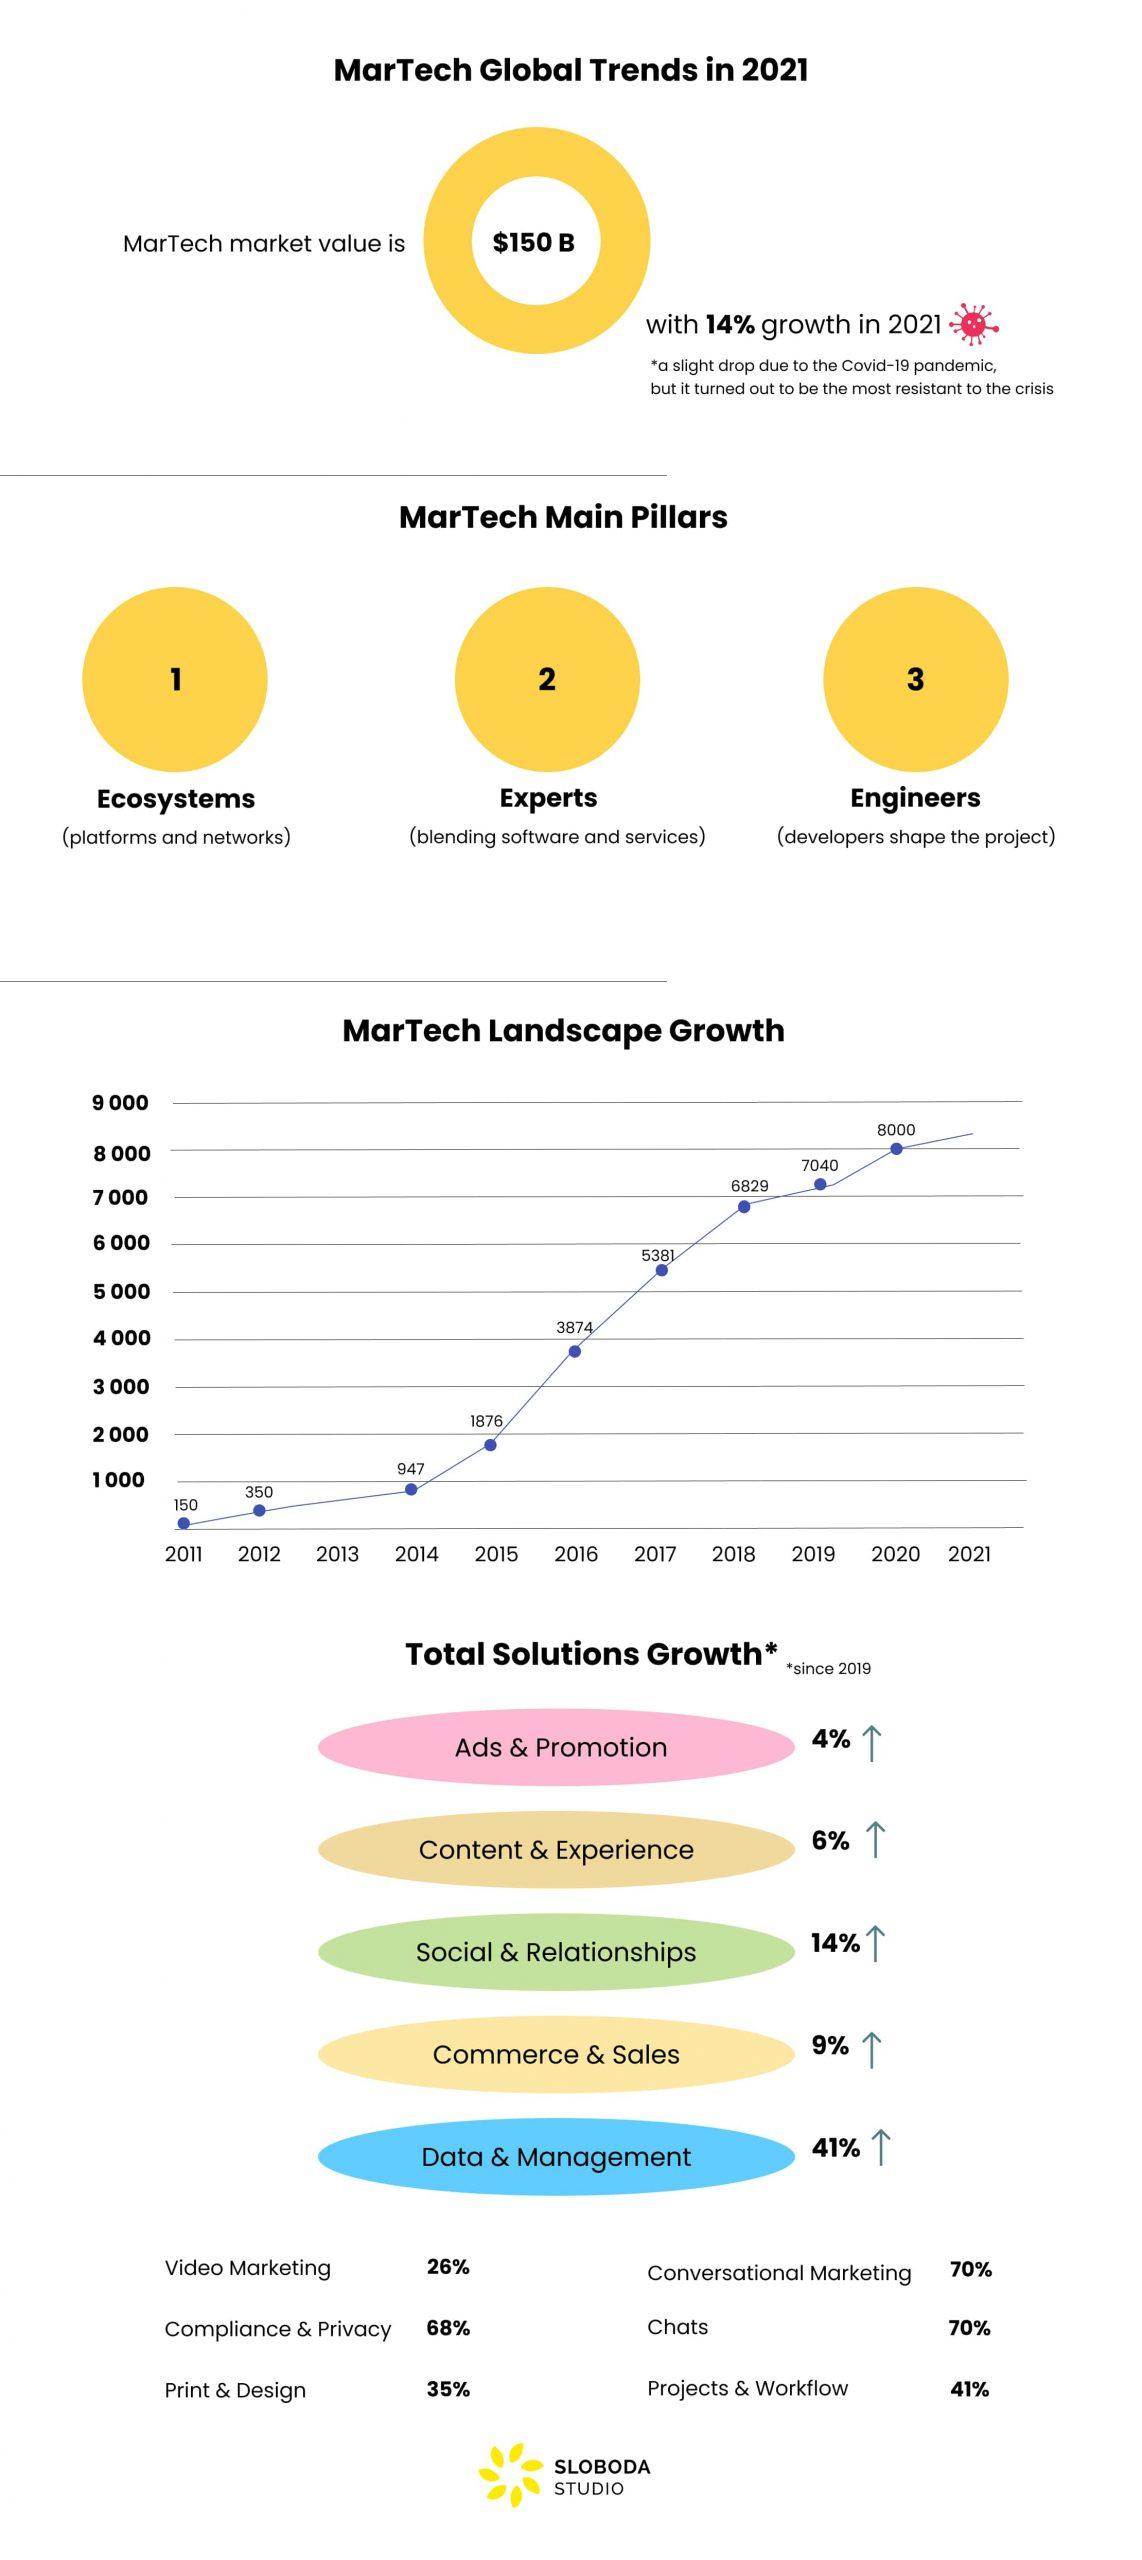 MarTech global trends in 2021